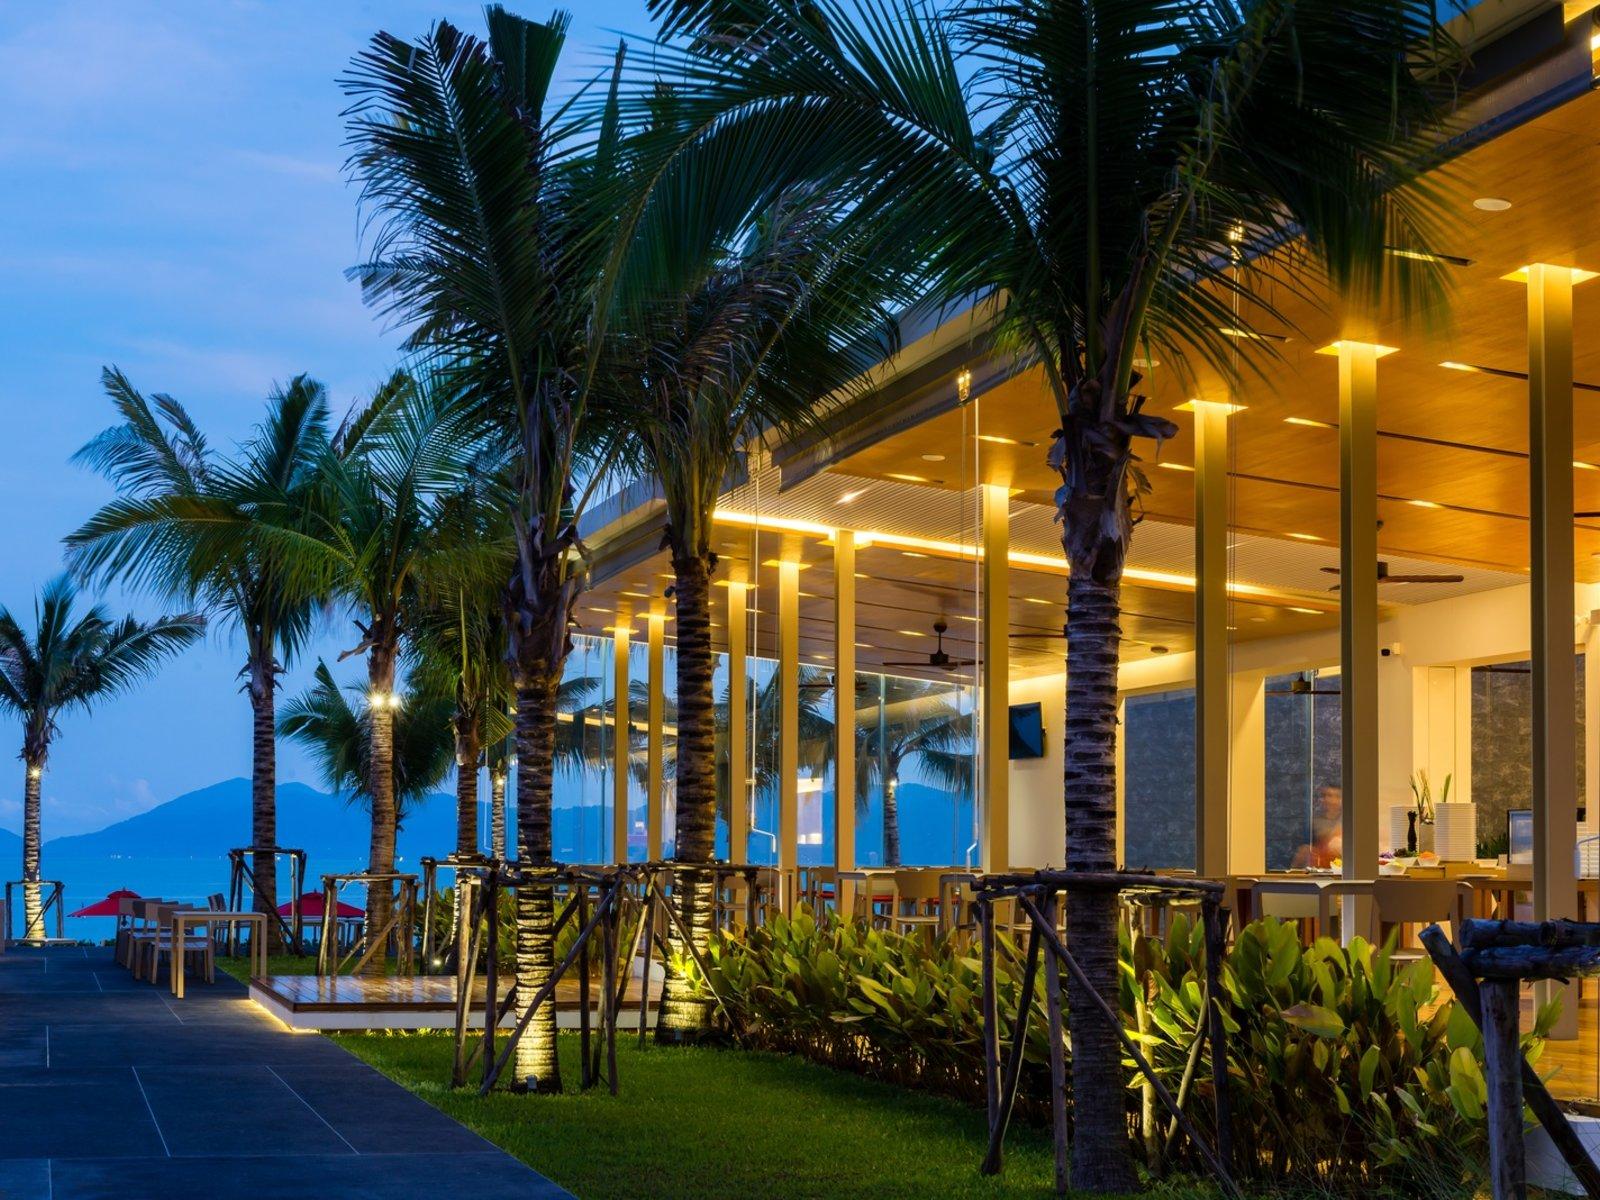 The Beachfront Restaurant